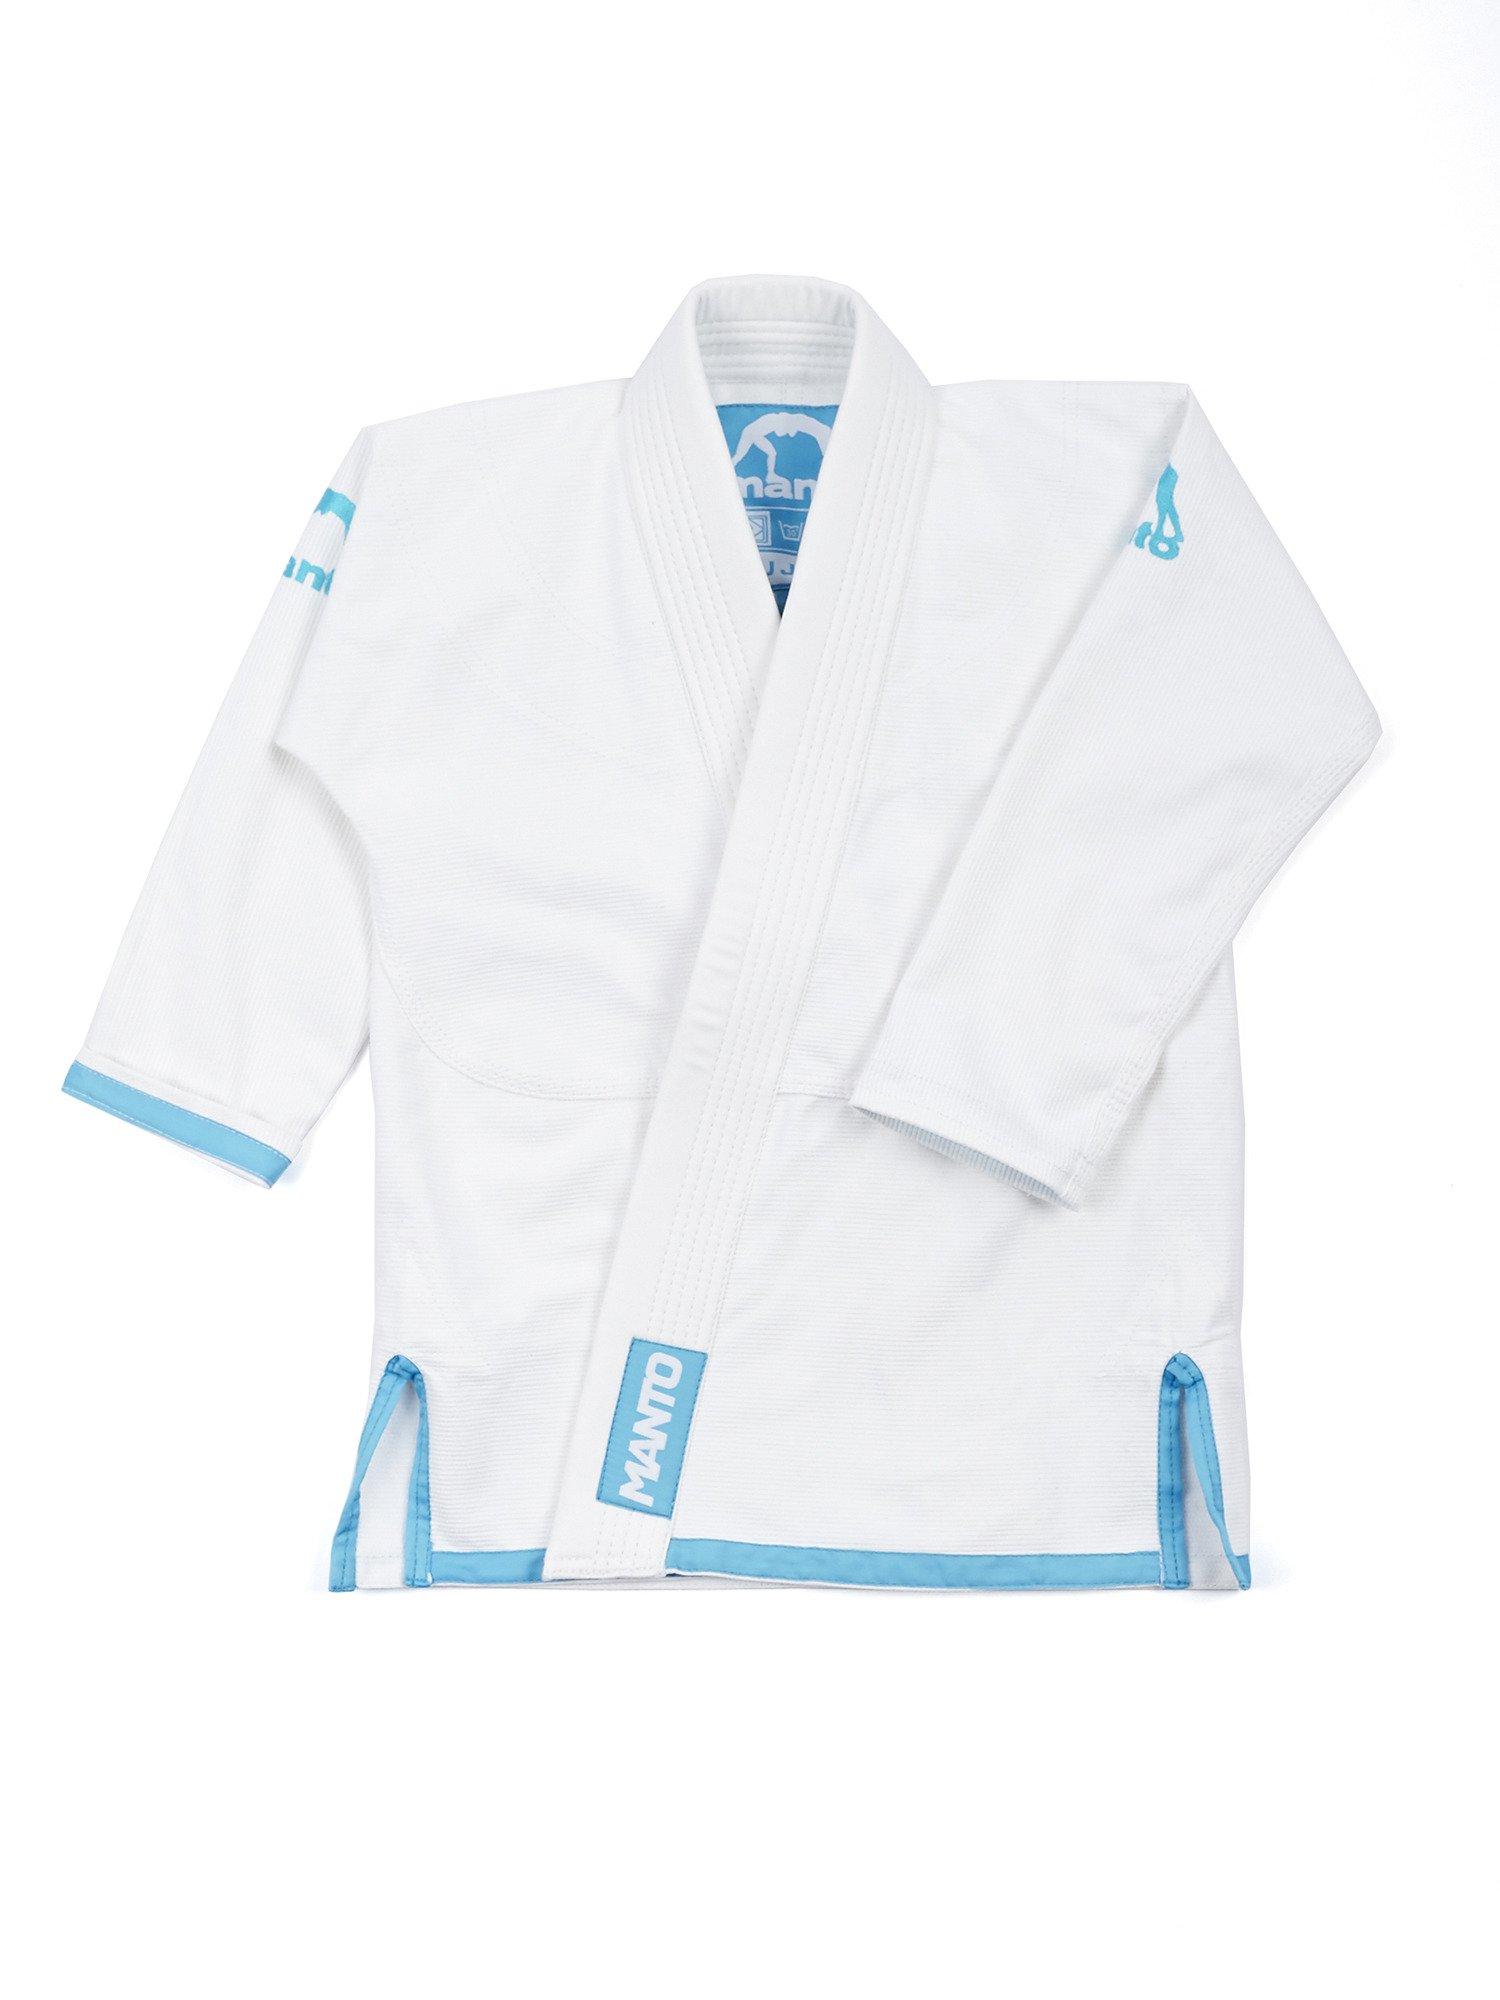 Gi Top /& Bag Kids Pearl Weave Jiu Jitsu Gi Black Size M1//A0 2 Pants